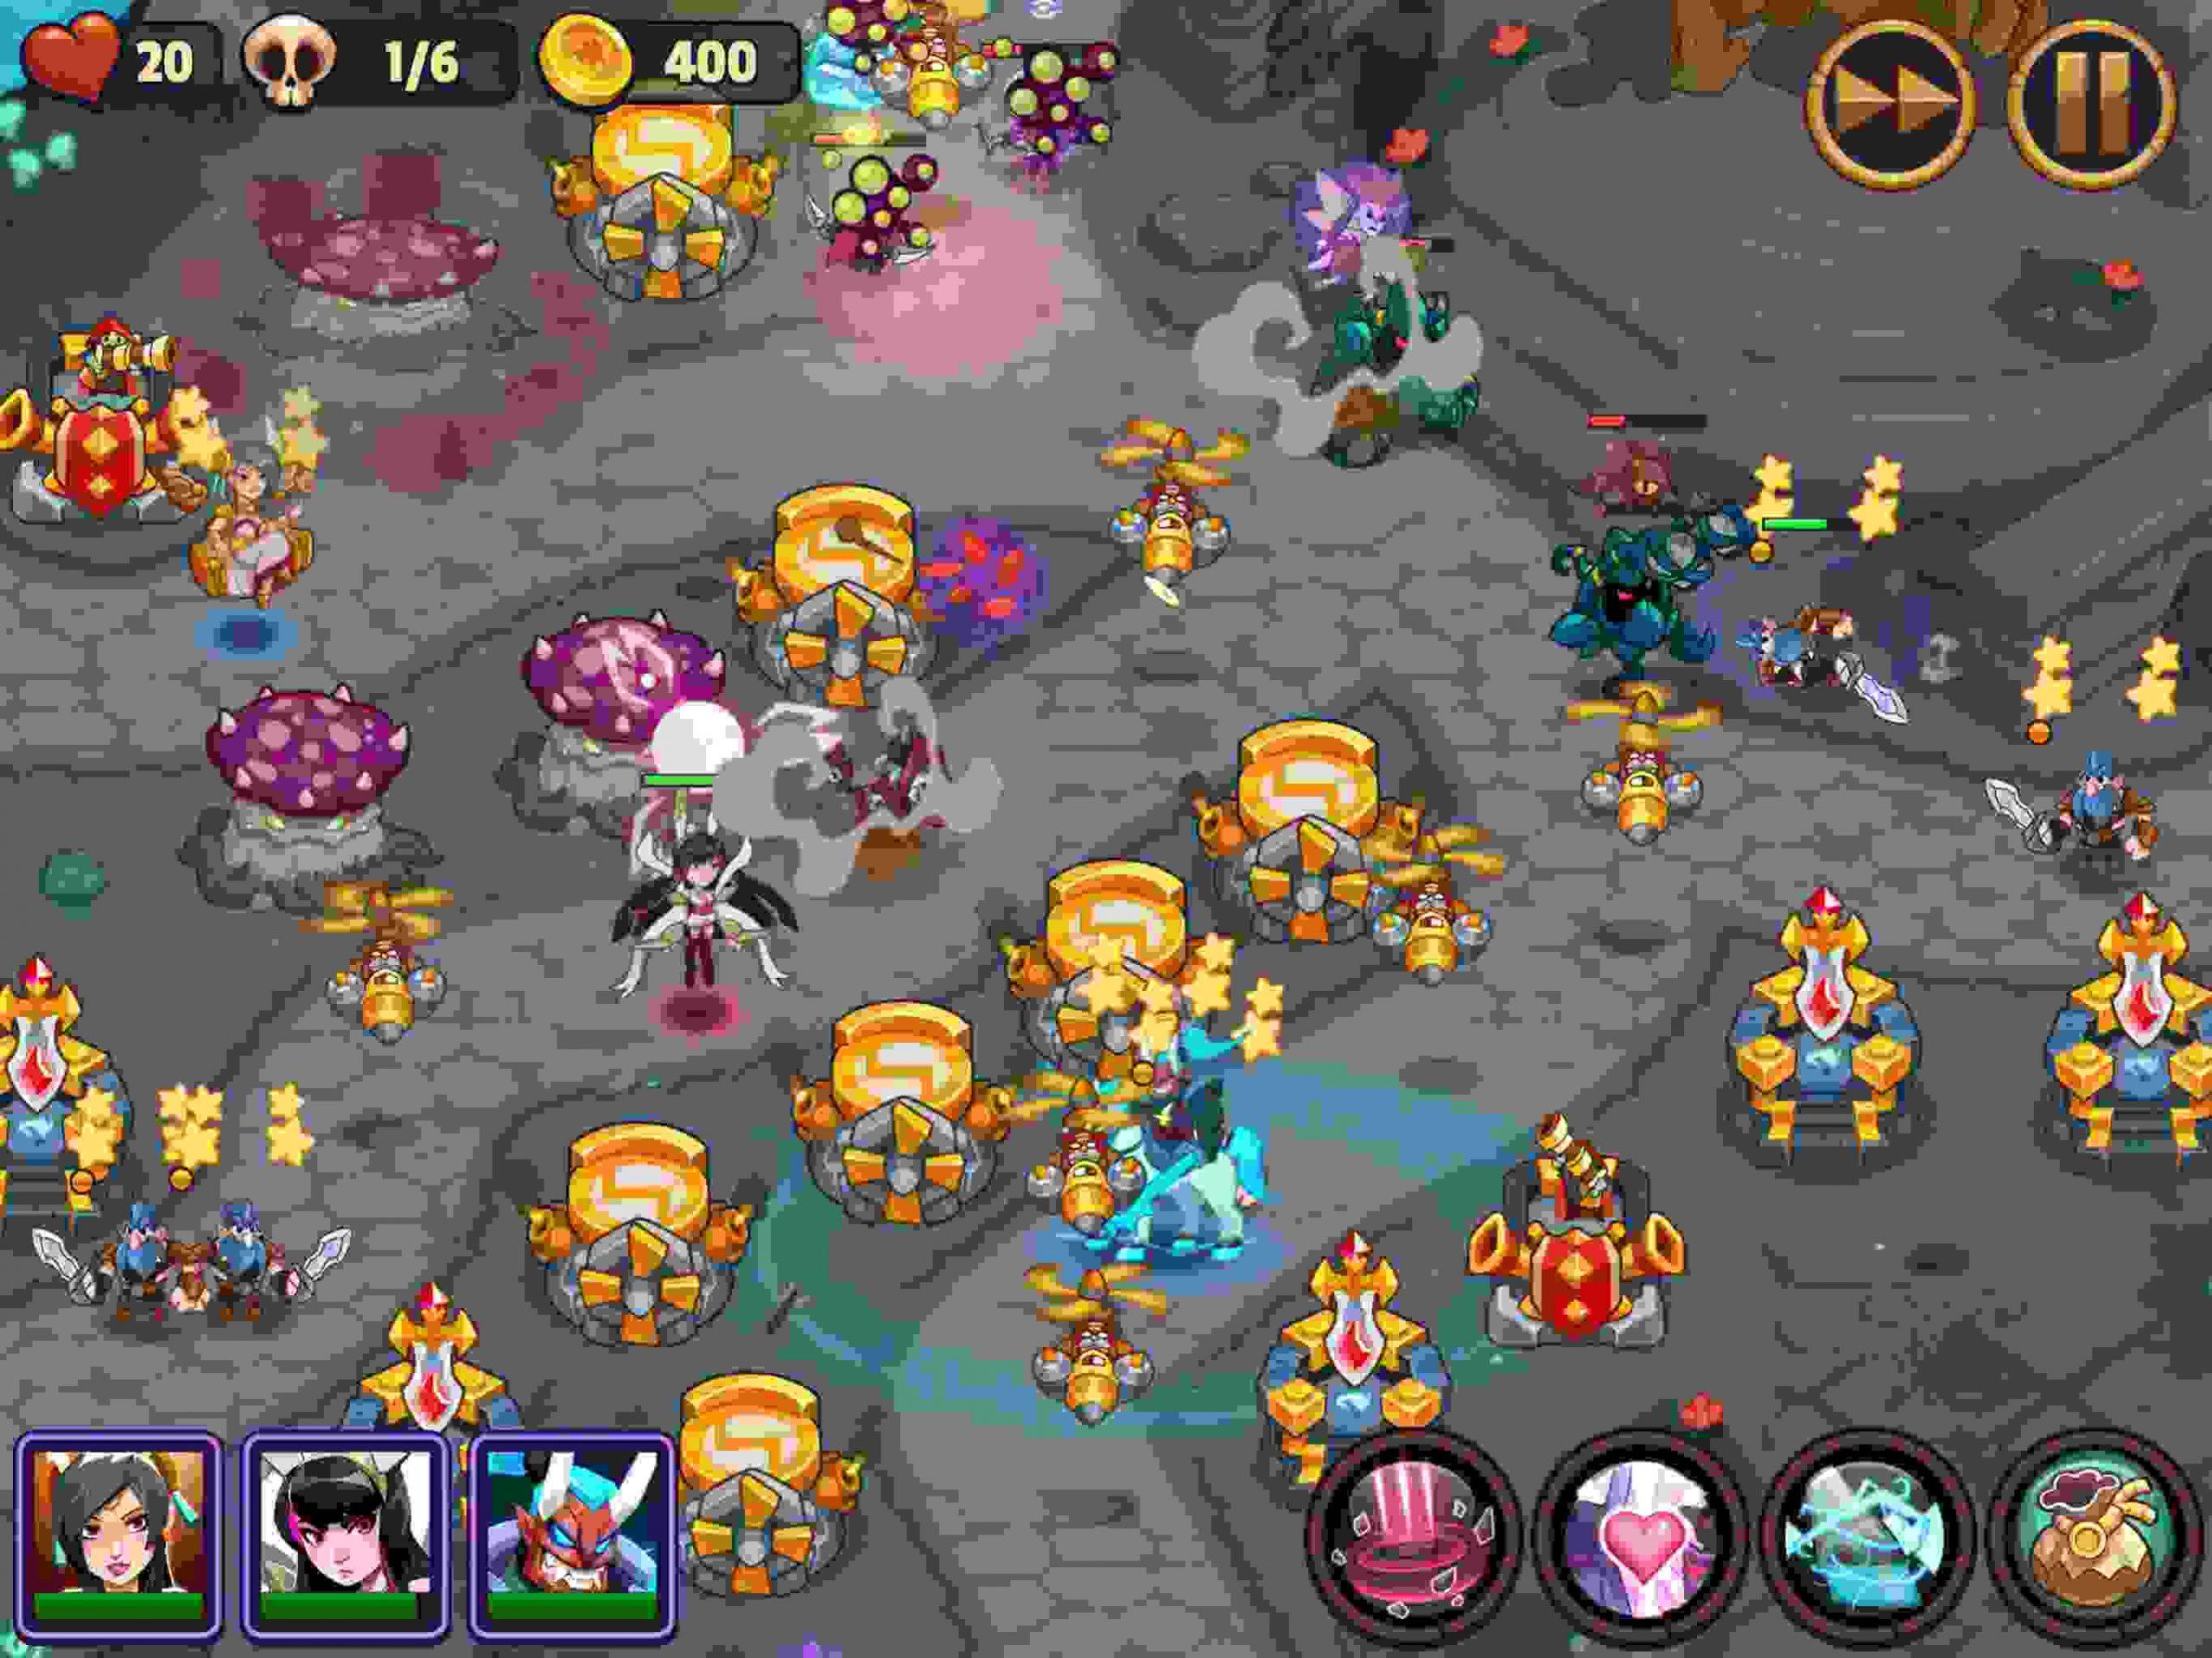 game Realm Defense mod hack